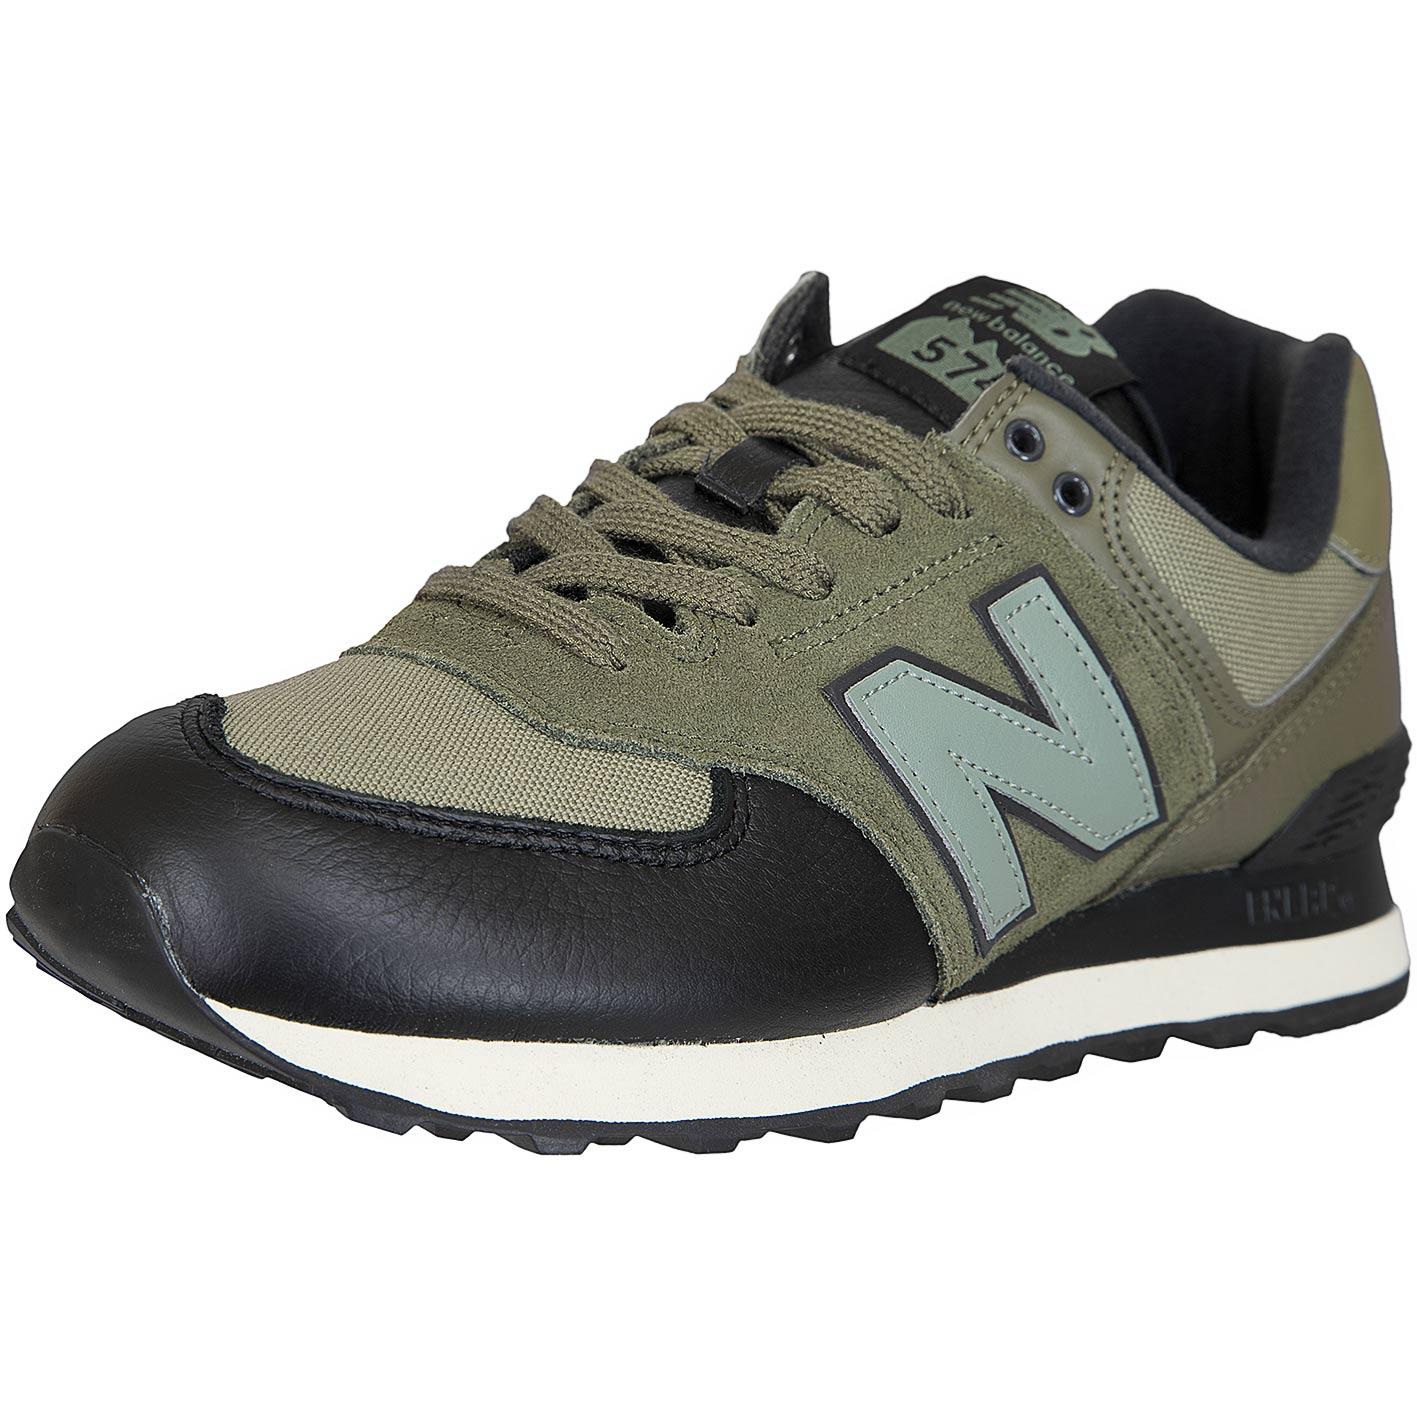 size 40 096f9 737aa New Balance Sneaker 574 Leder/Mesh/PU grün/schwarz